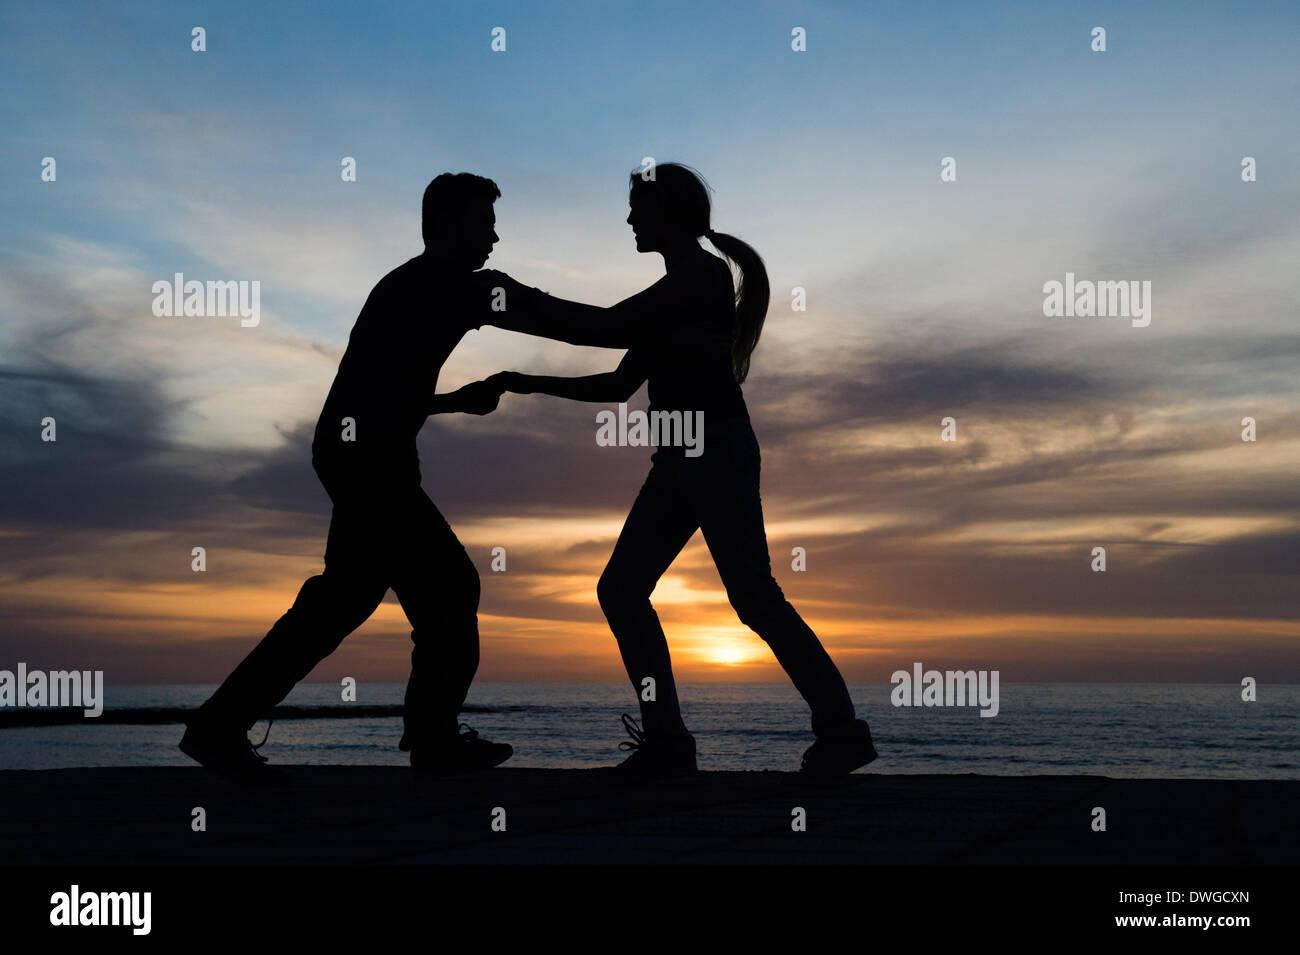 83533e38797 Swing Dance Stock Photos   Swing Dance Stock Images - Alamy